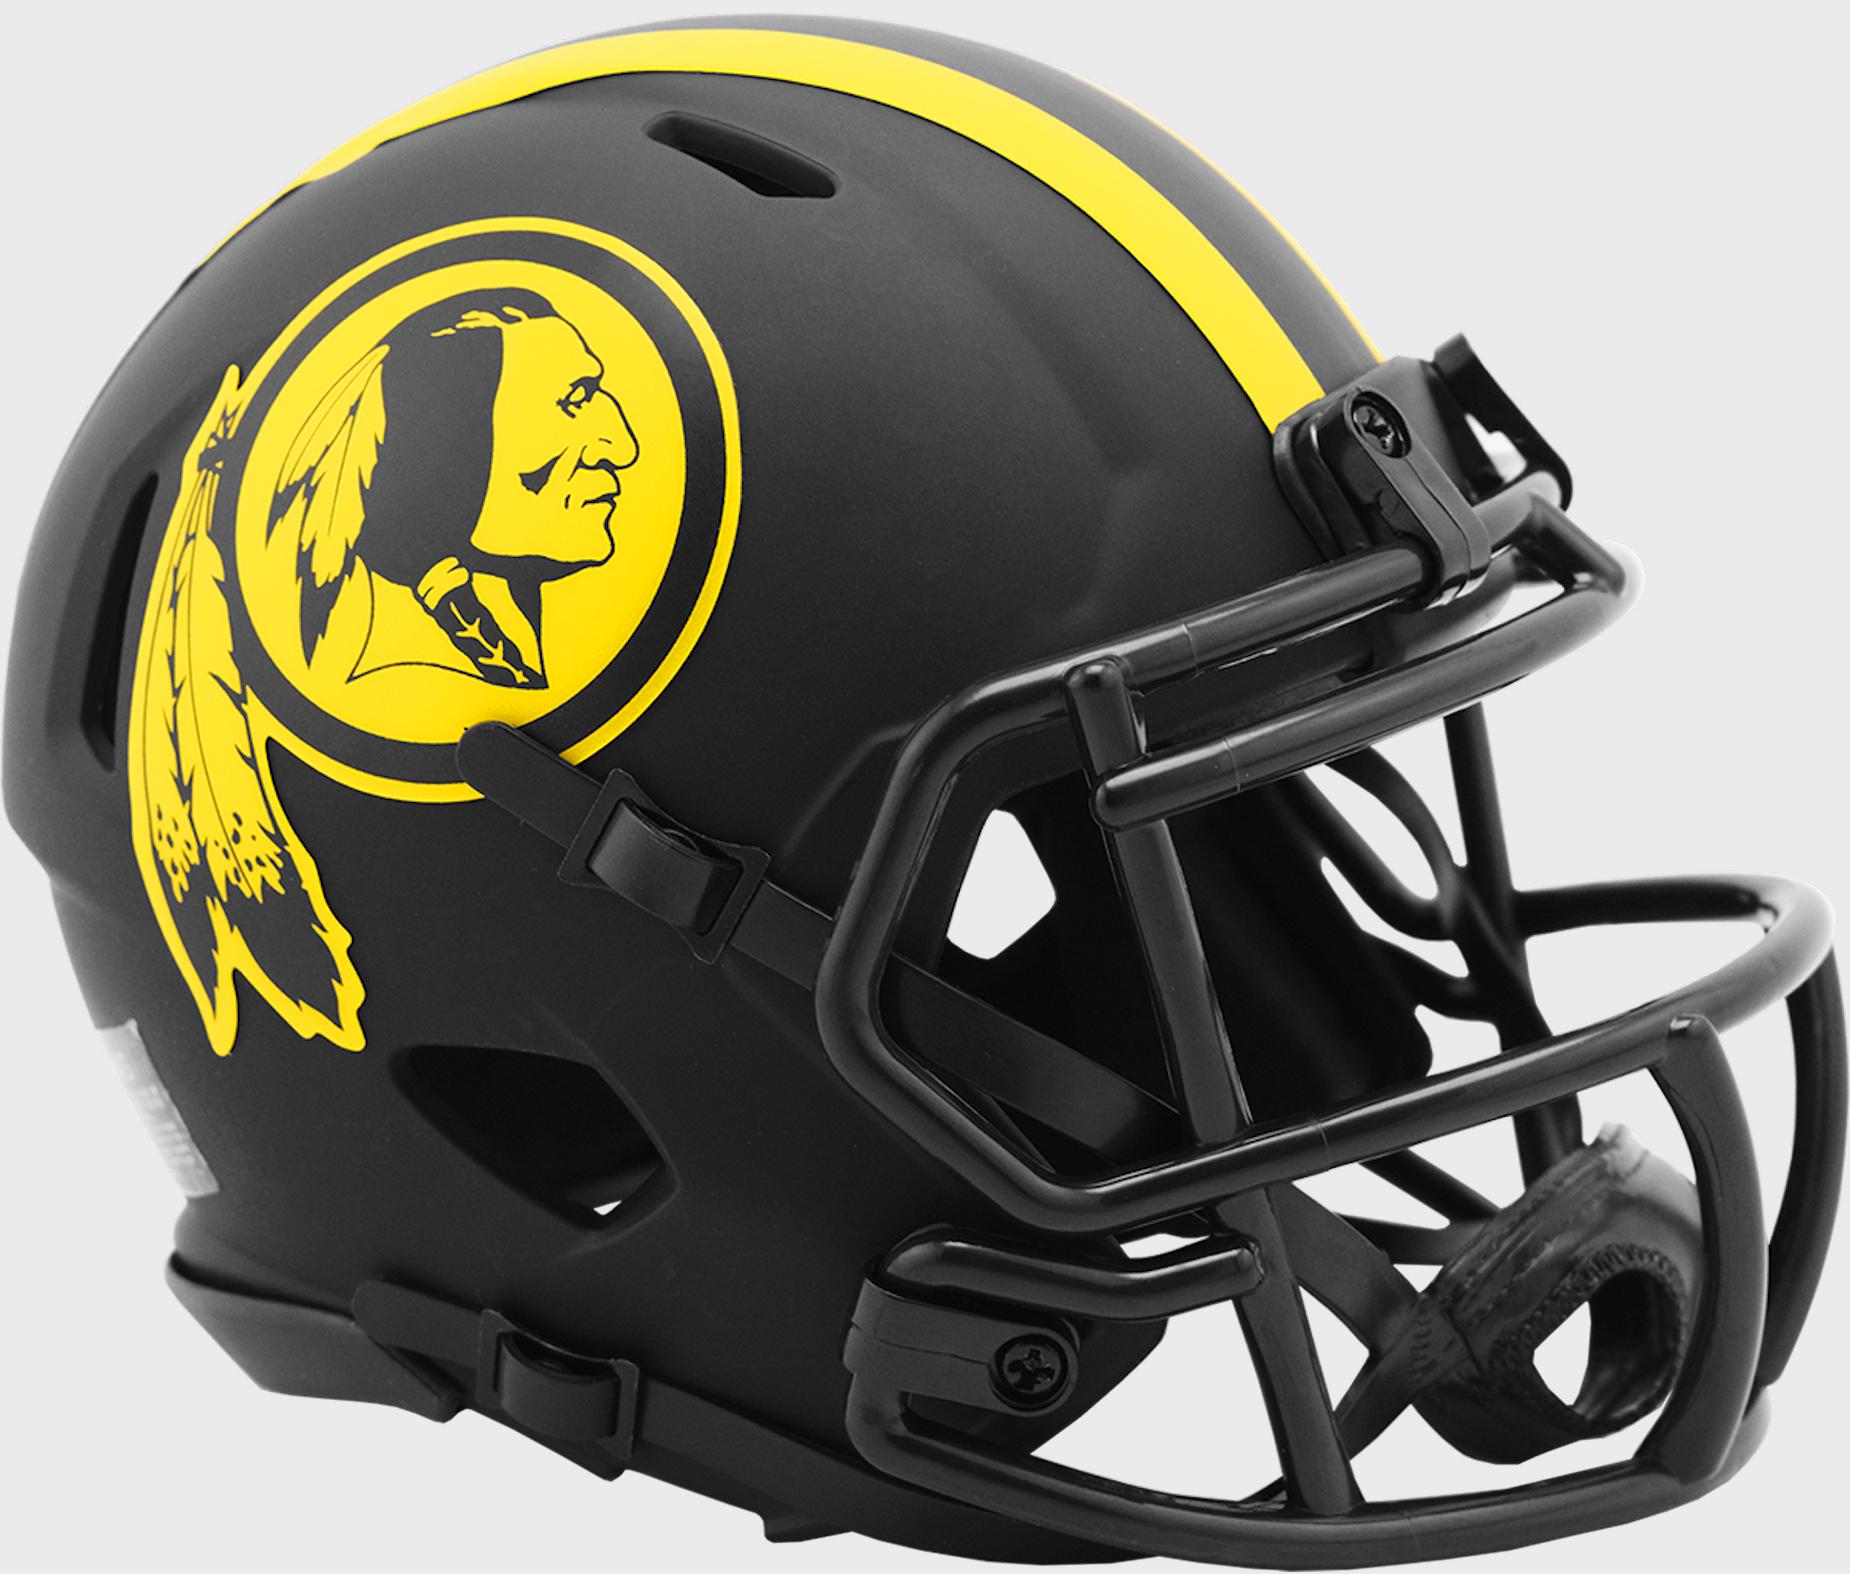 Washington Redskins NFL Mini Speed Football Helmet <B>ECLIPSE</B>